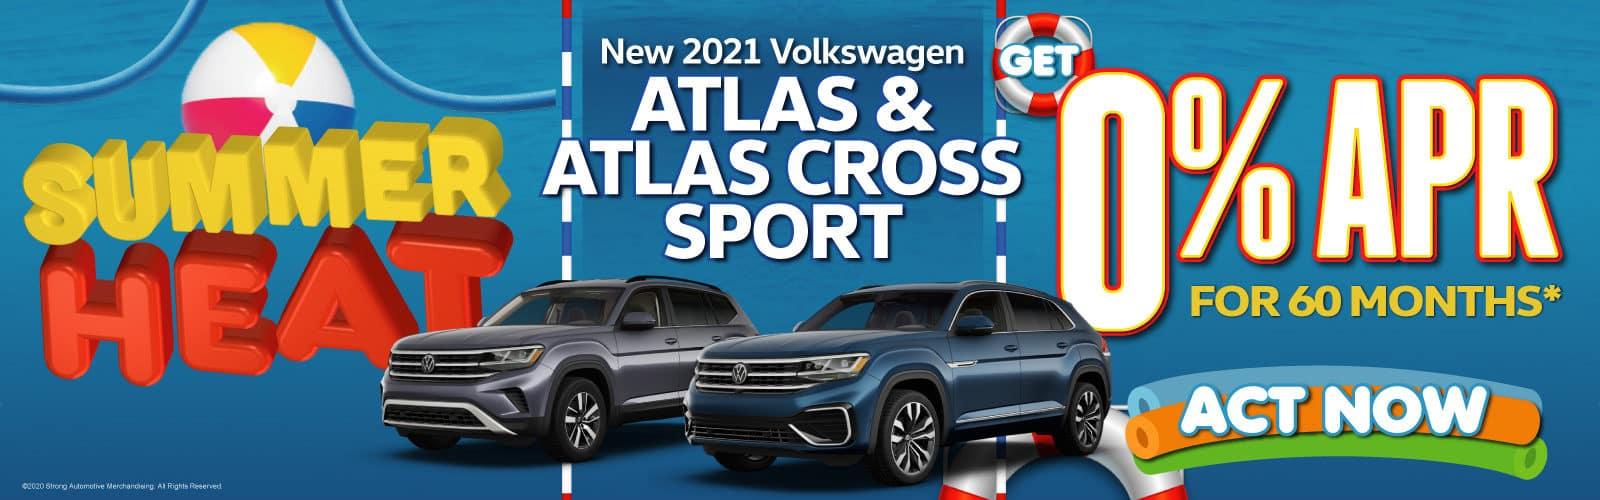 New 2021 VW Atlas and Atlas Cross Sport - 0% APR for 60 months